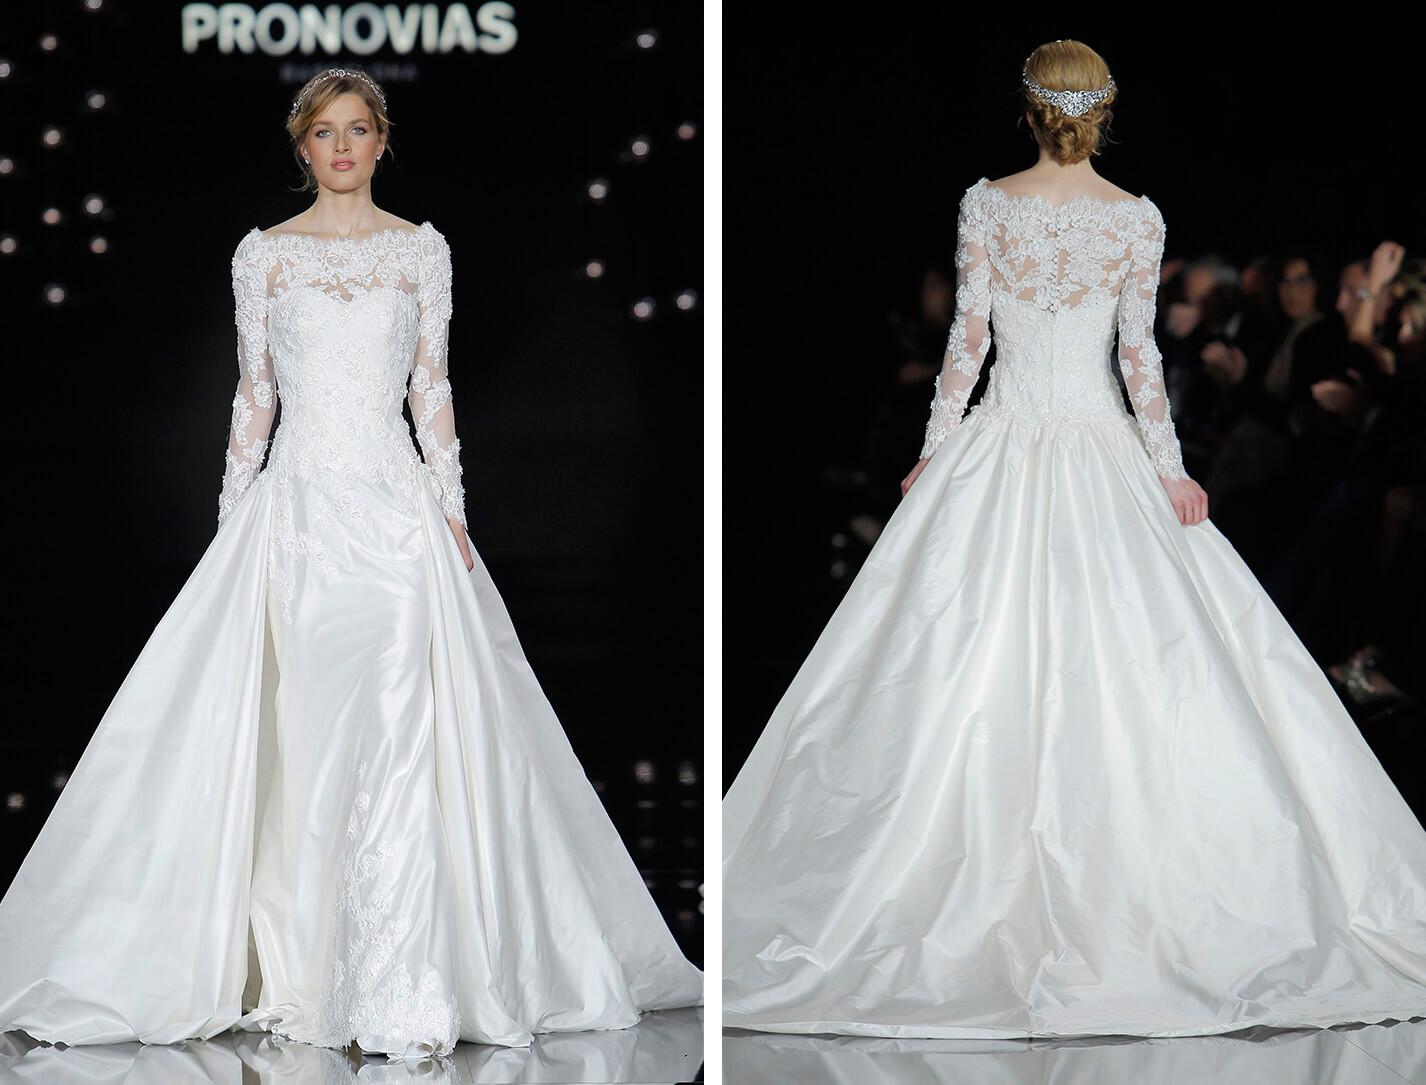 PRONOVIAS_Fashion_Show_2017_Nectar